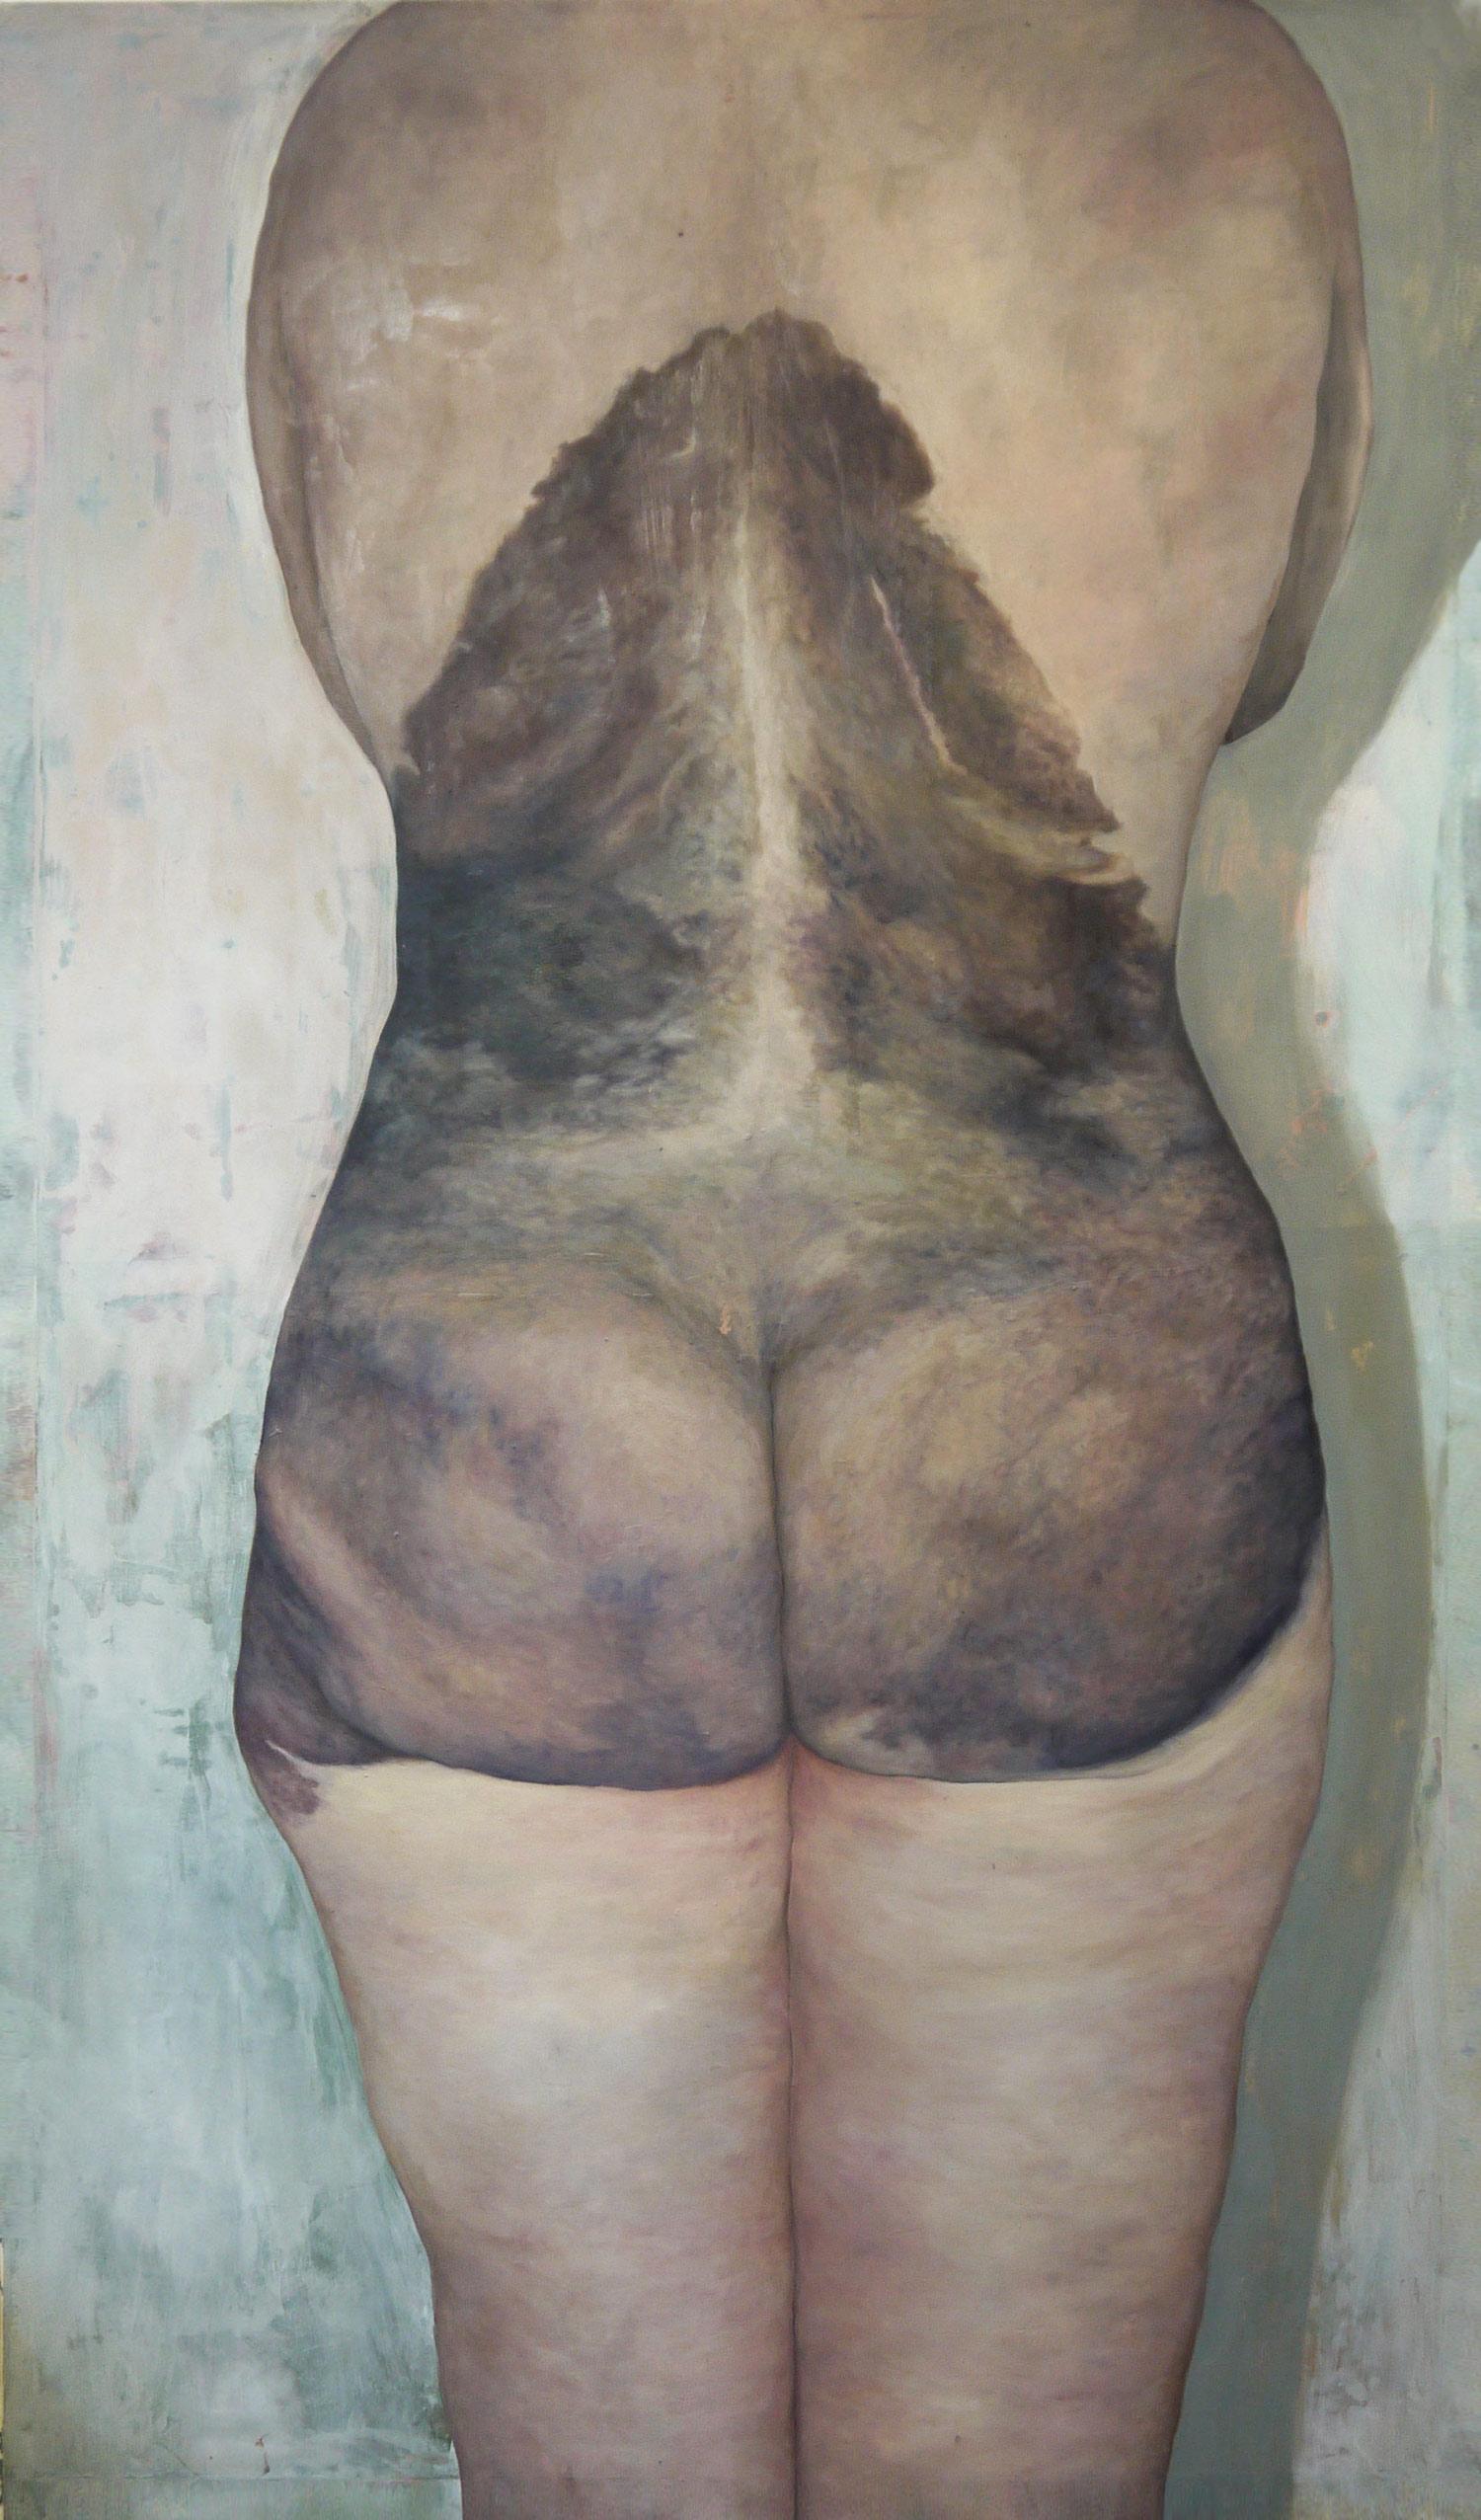 Laura Link . Neavus Flammerus Gigantus 1 . 2014 . Öl, Wachs auf Leinwand . 256 x 150